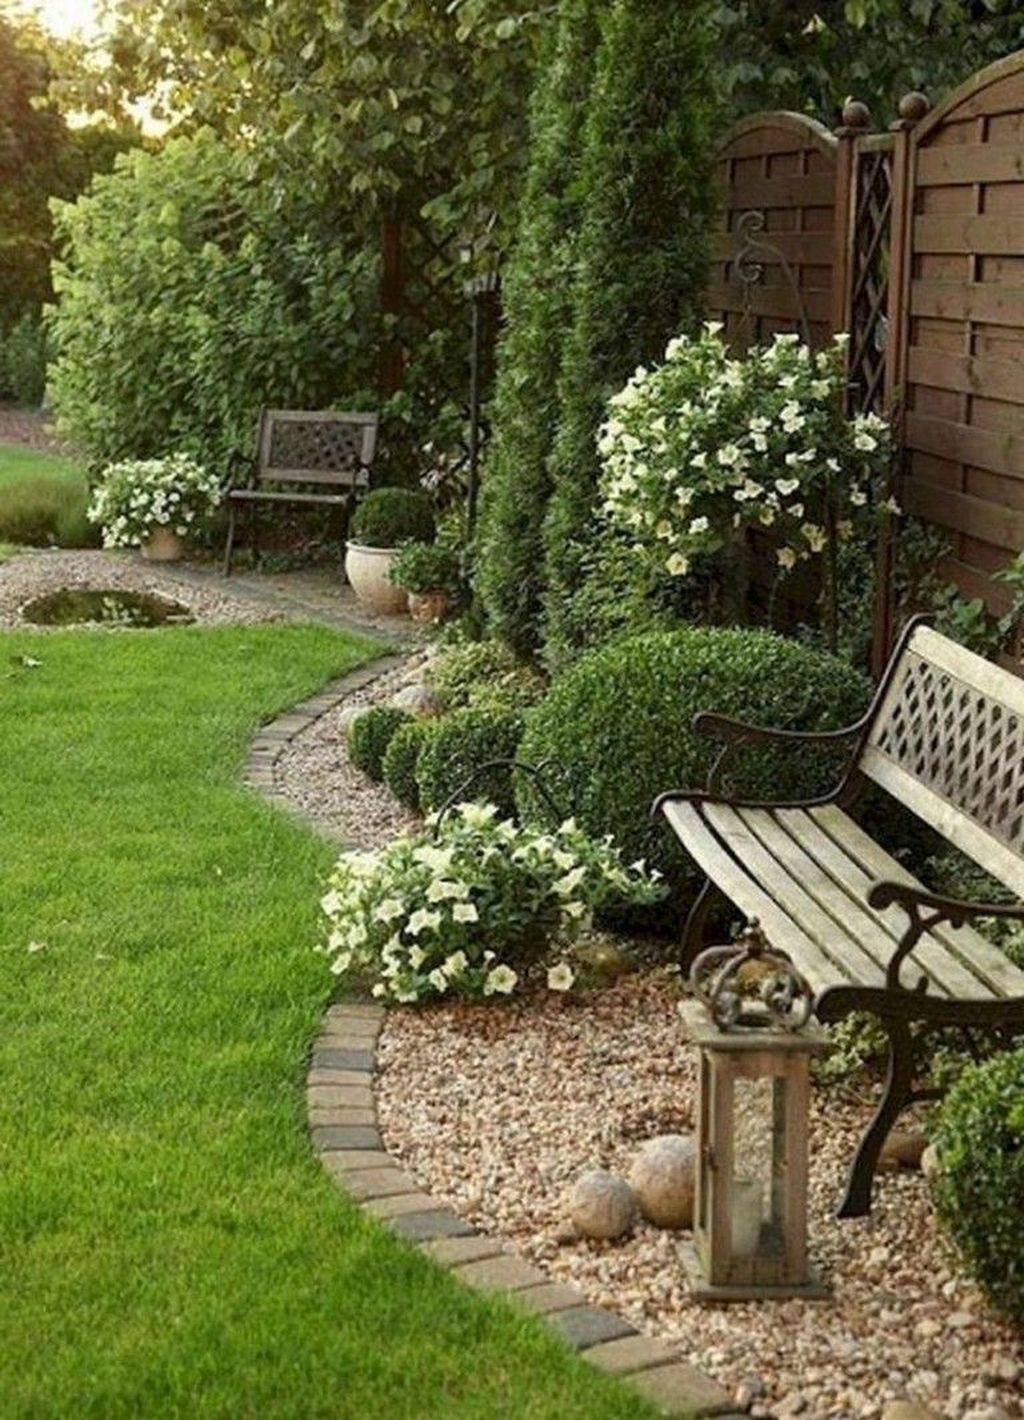 backyard landscaping ideas with minimum budget home on backyard landscaping ideas with minimum budget id=32969